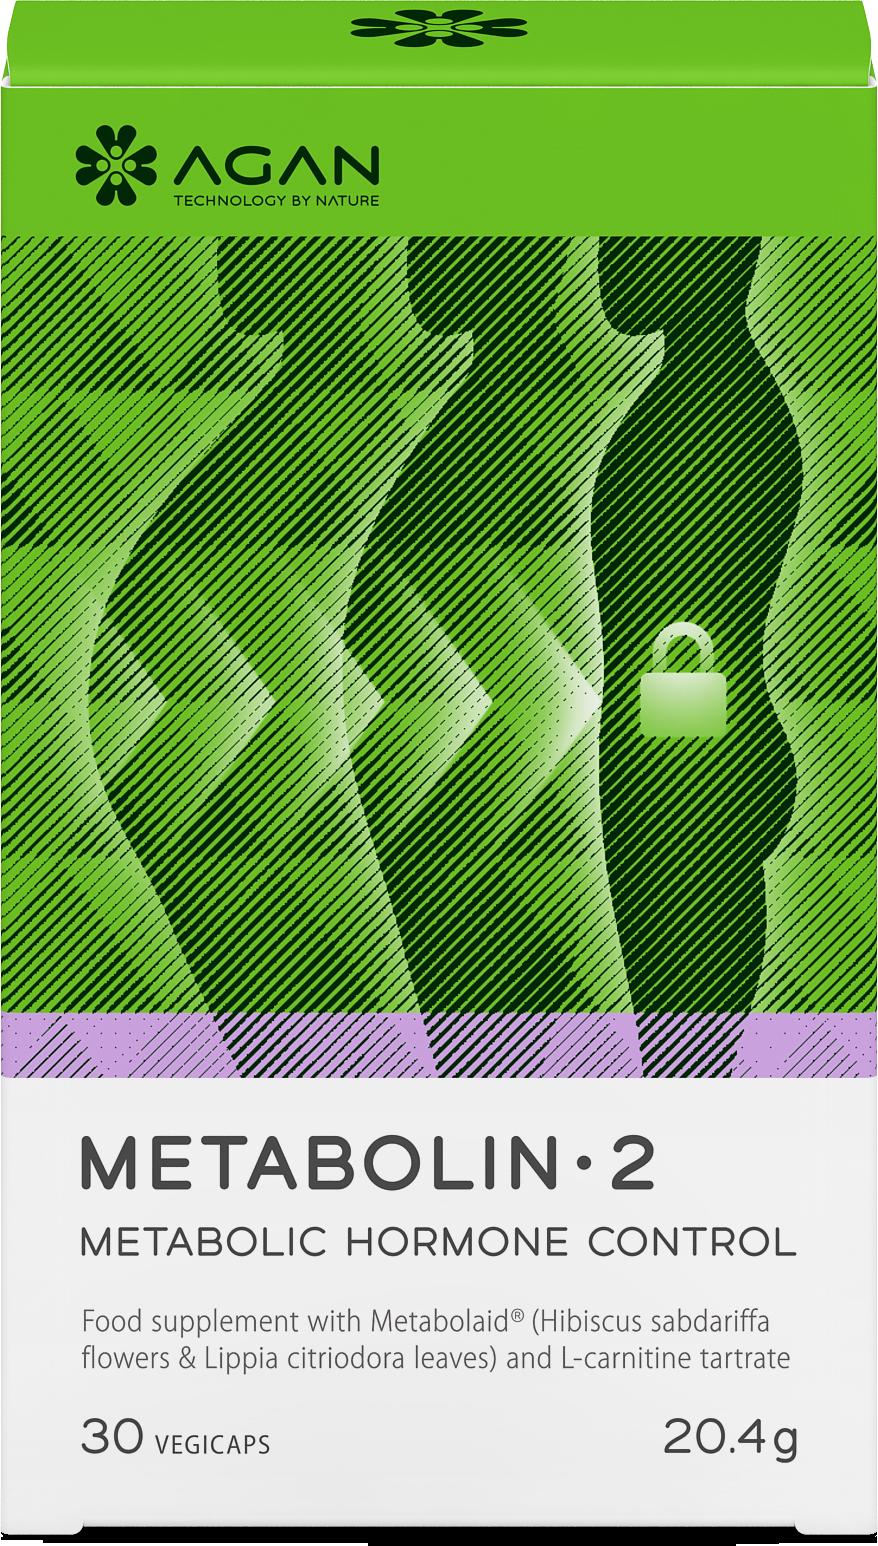 METABOLIN 2 METABOLIC HORMONE CONTROL